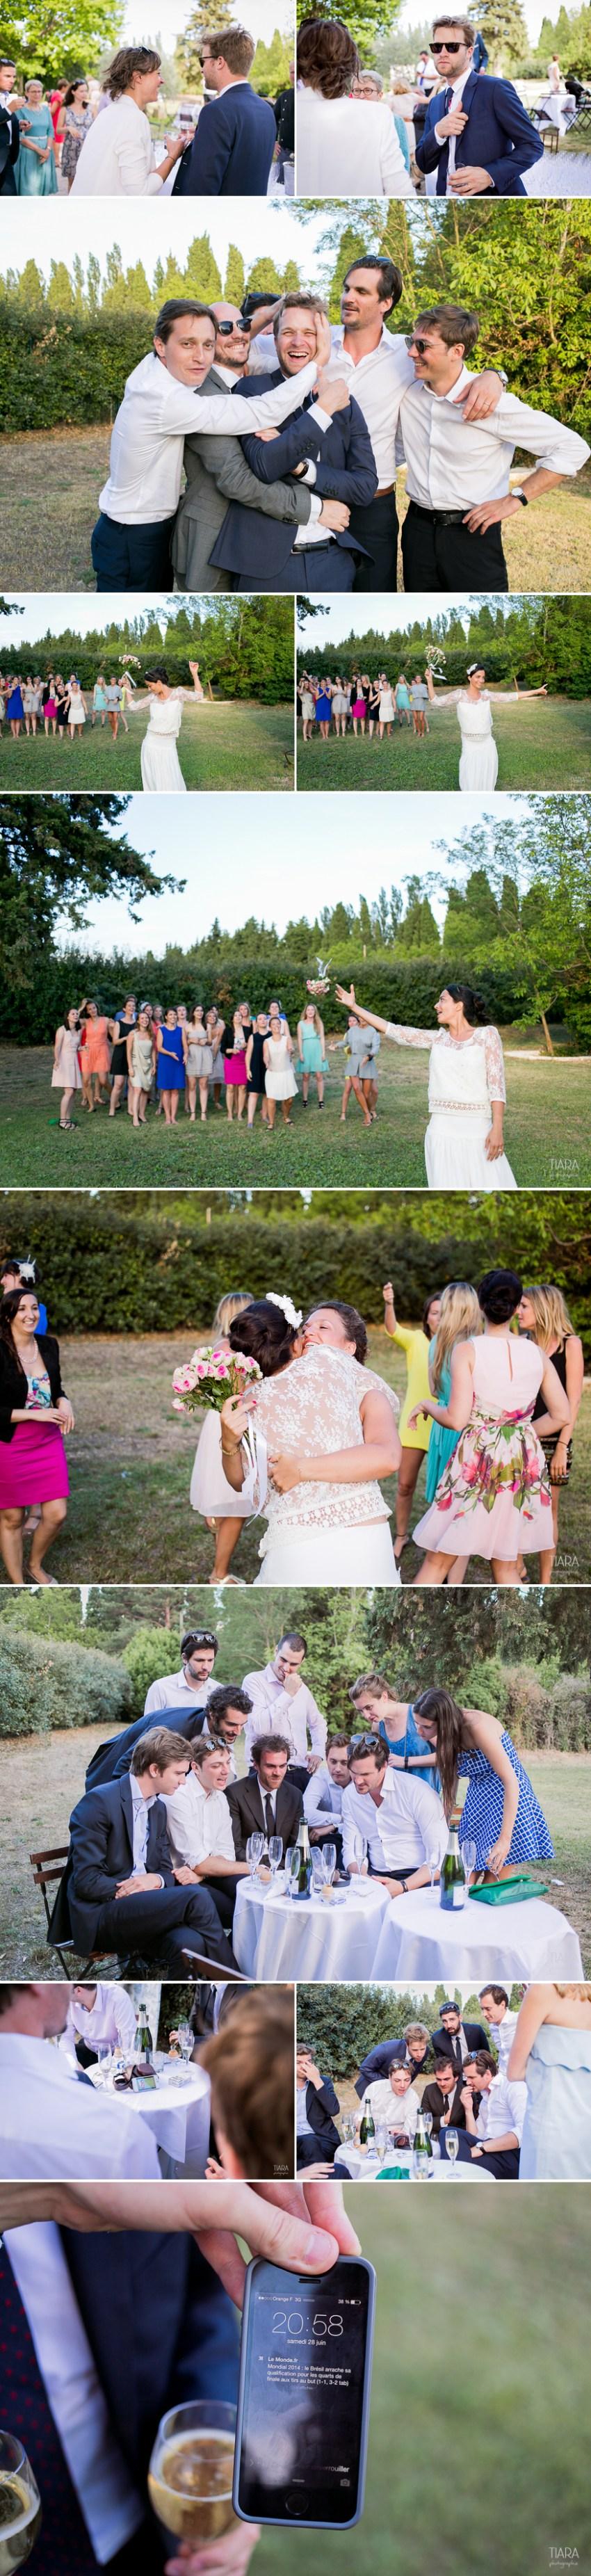 lauredesagazan-photographe-mariage-provence-reunion